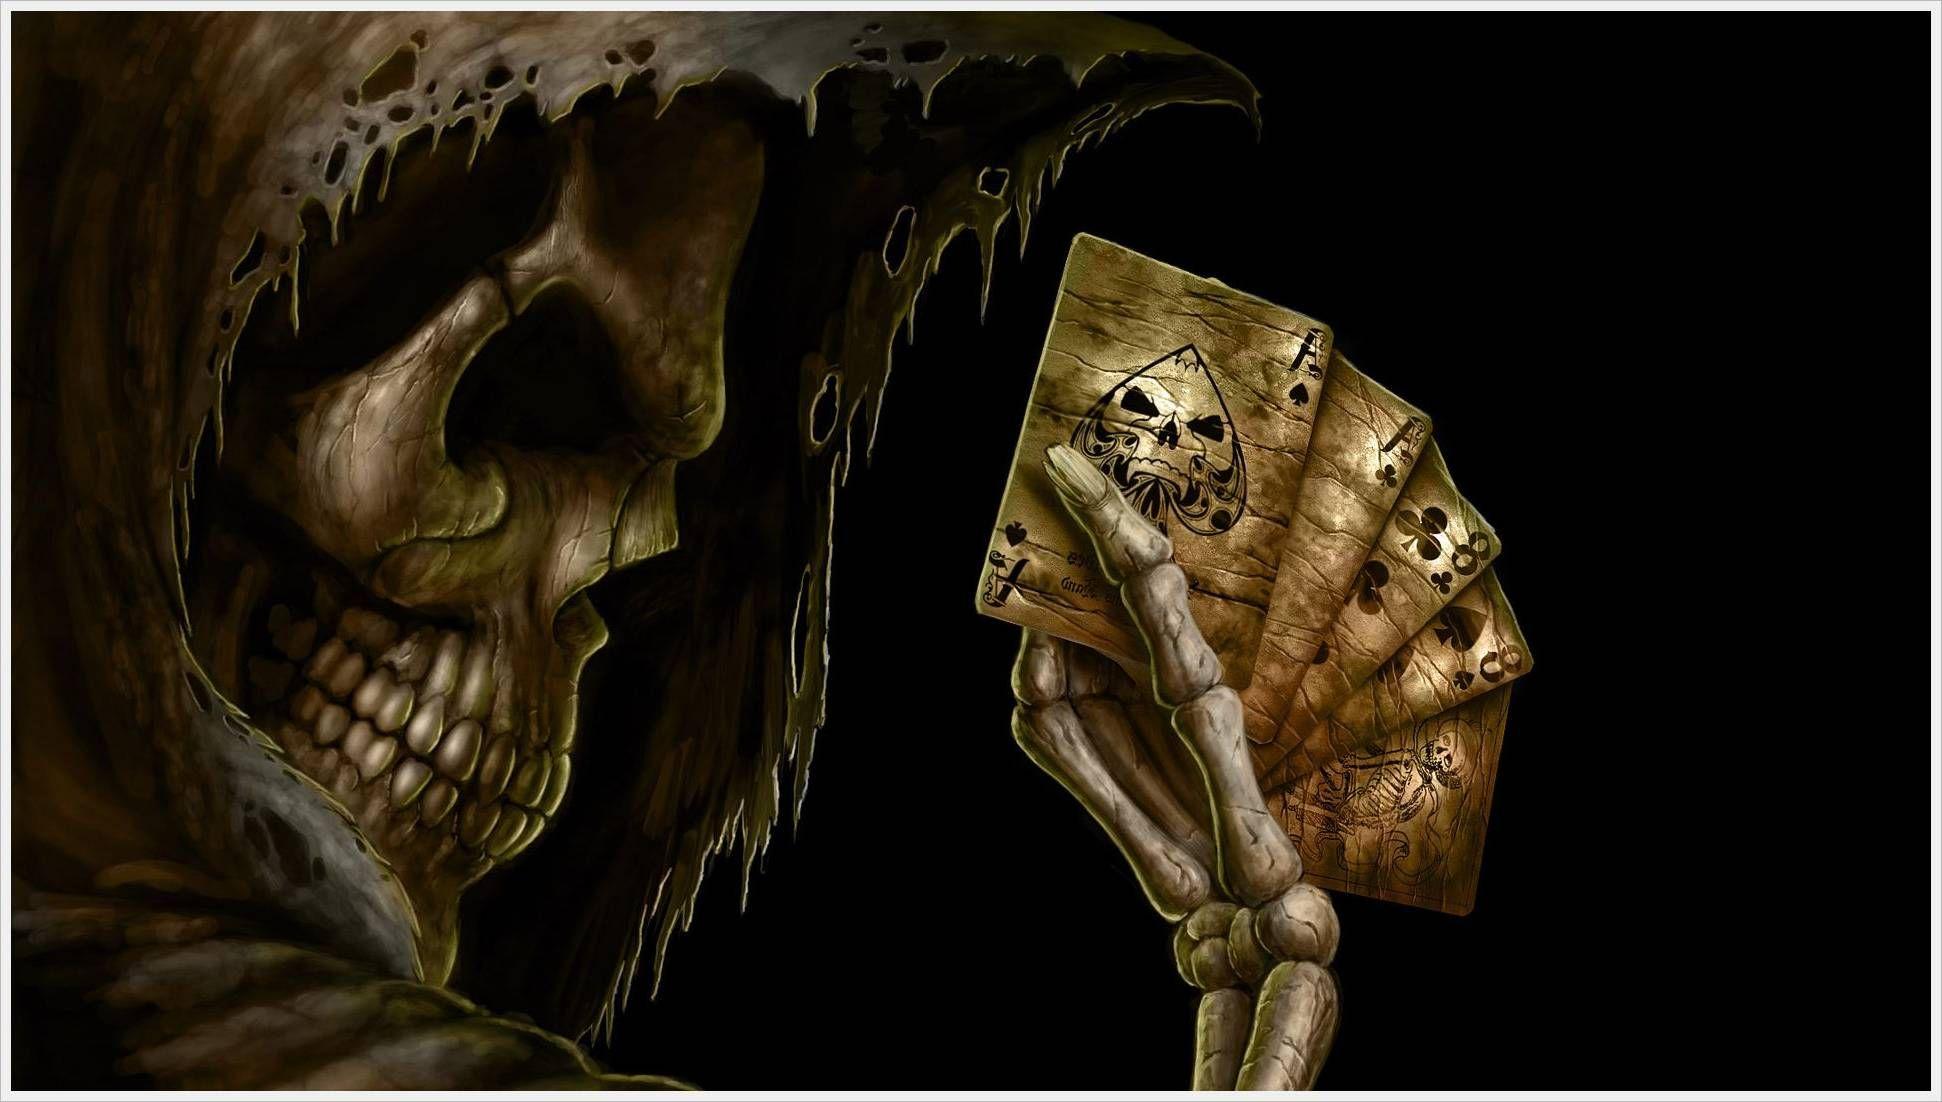 3D Moving Wallpaper Animated Horror Skull 540x306 Animated